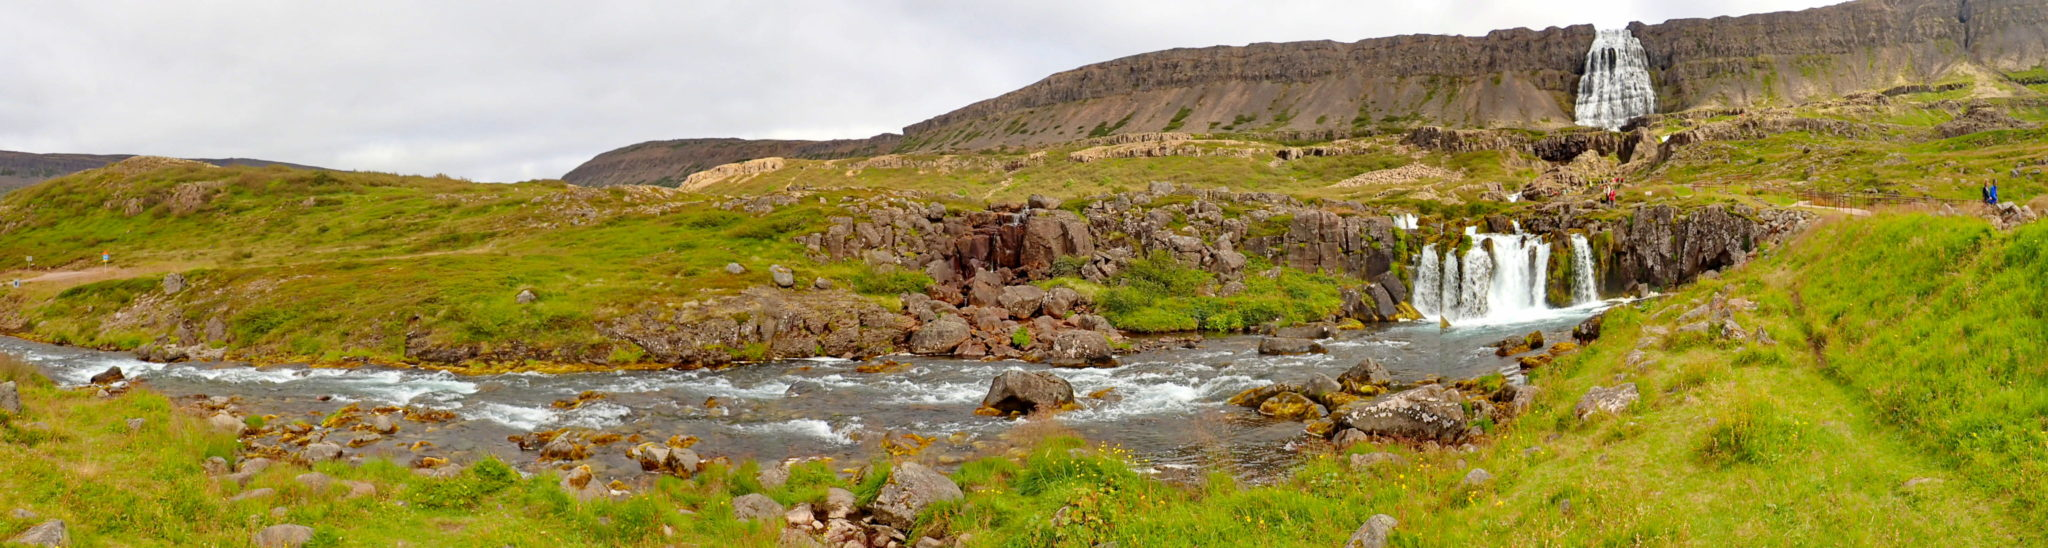 Fjallfoss på Island ligger vakkert til i Arnarfjördur.